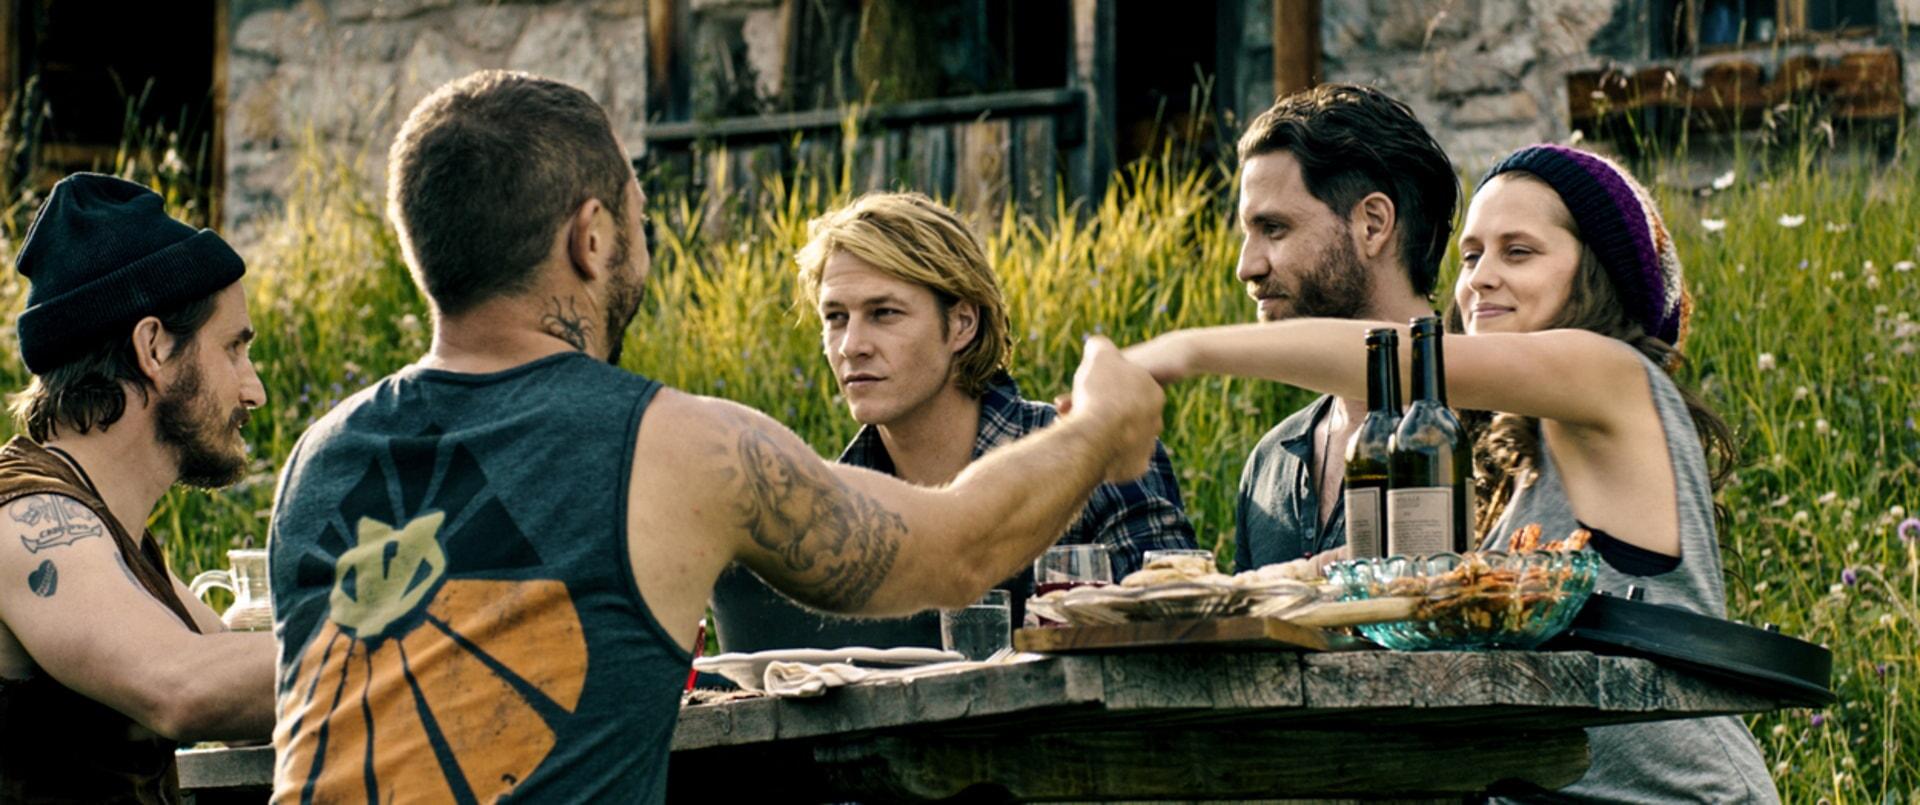 "CLEMENS SCHICK as Roach, MATIAS VARELA as Grommet, LUKE BRACEY as Utah, EDGAR RAMIREZ as Bodhi and TERESA PALMER as Samsara in Alcon Entertainment's action thriller ""POINT BREAK,"" a Warner Bros. Pictures release."